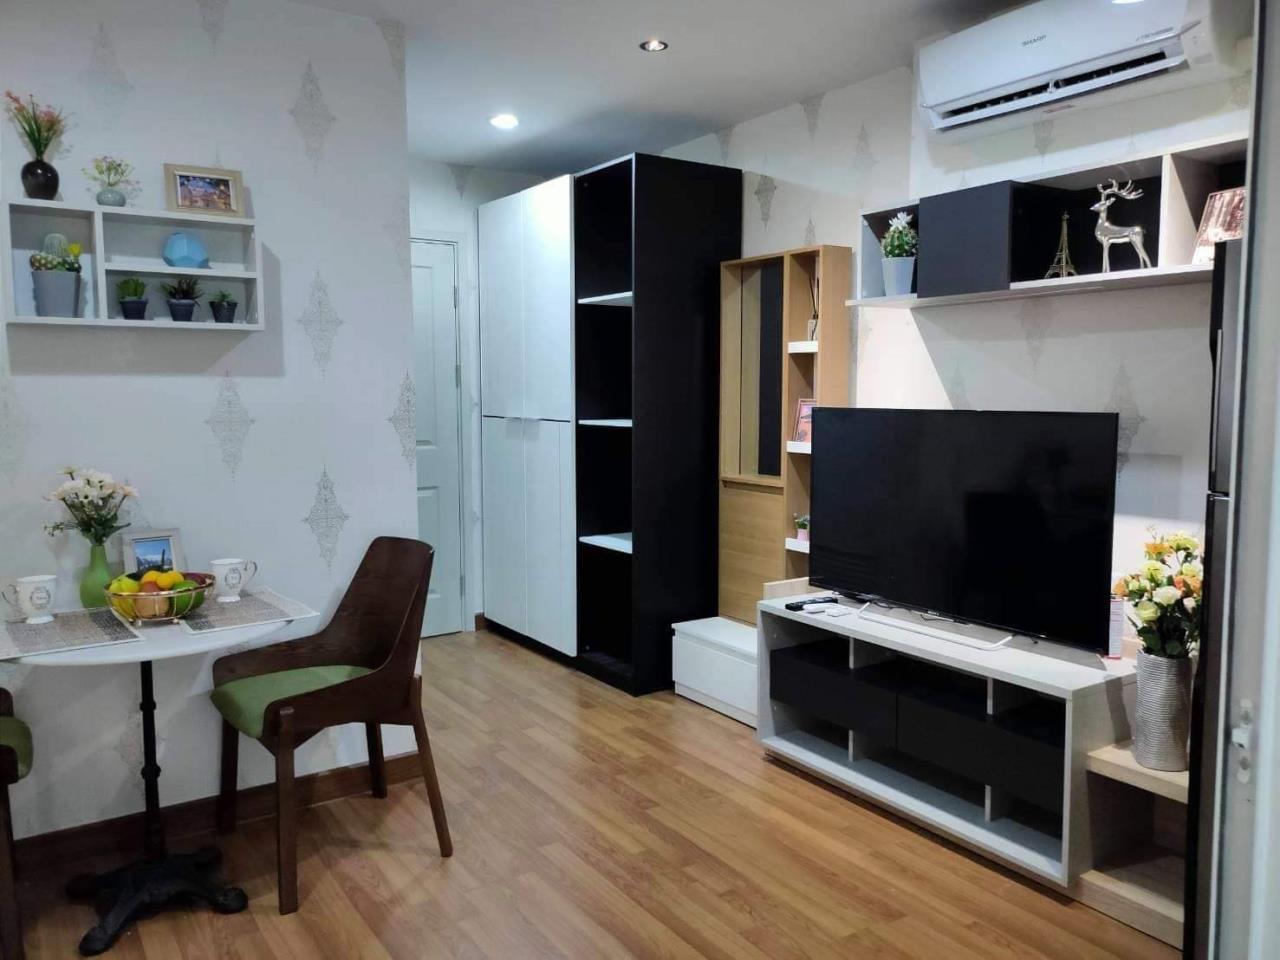 Blueocean property Agency's Condo For Rent – Regent home sukhumvit 81    4